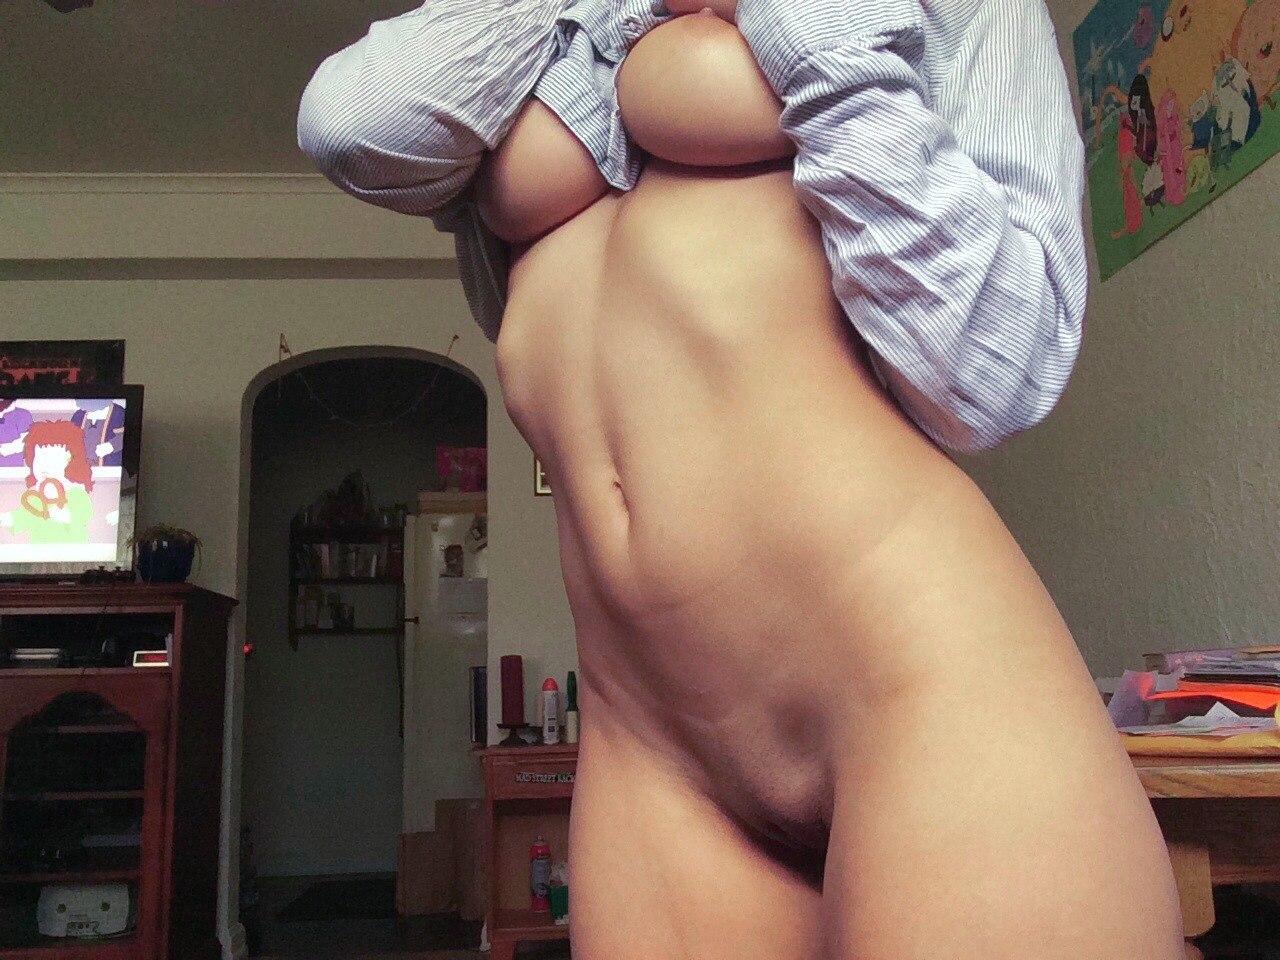 View casting porno en guatemala free